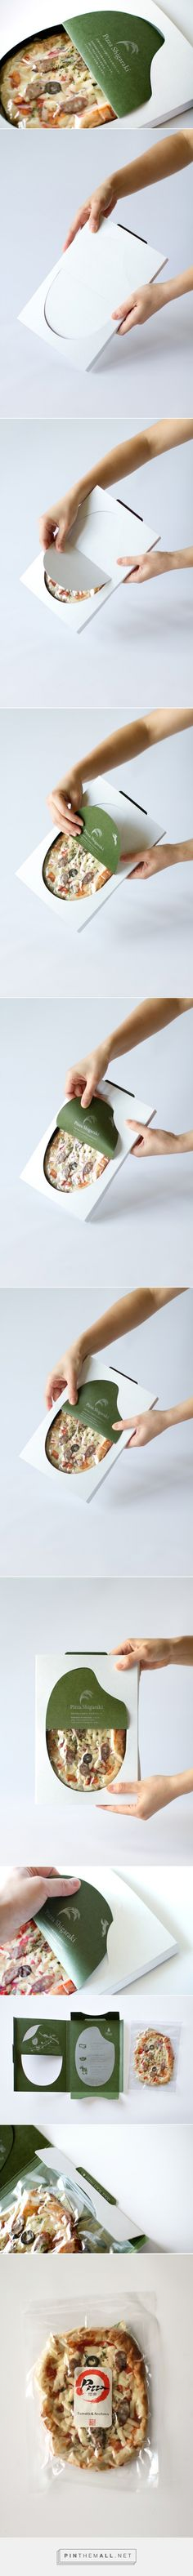 #Pizza Shigaraki #packaging designed by Masahiro Minami Design - http://www.packagingoftheworld.com/2015/04/pizza-shigaraki.html